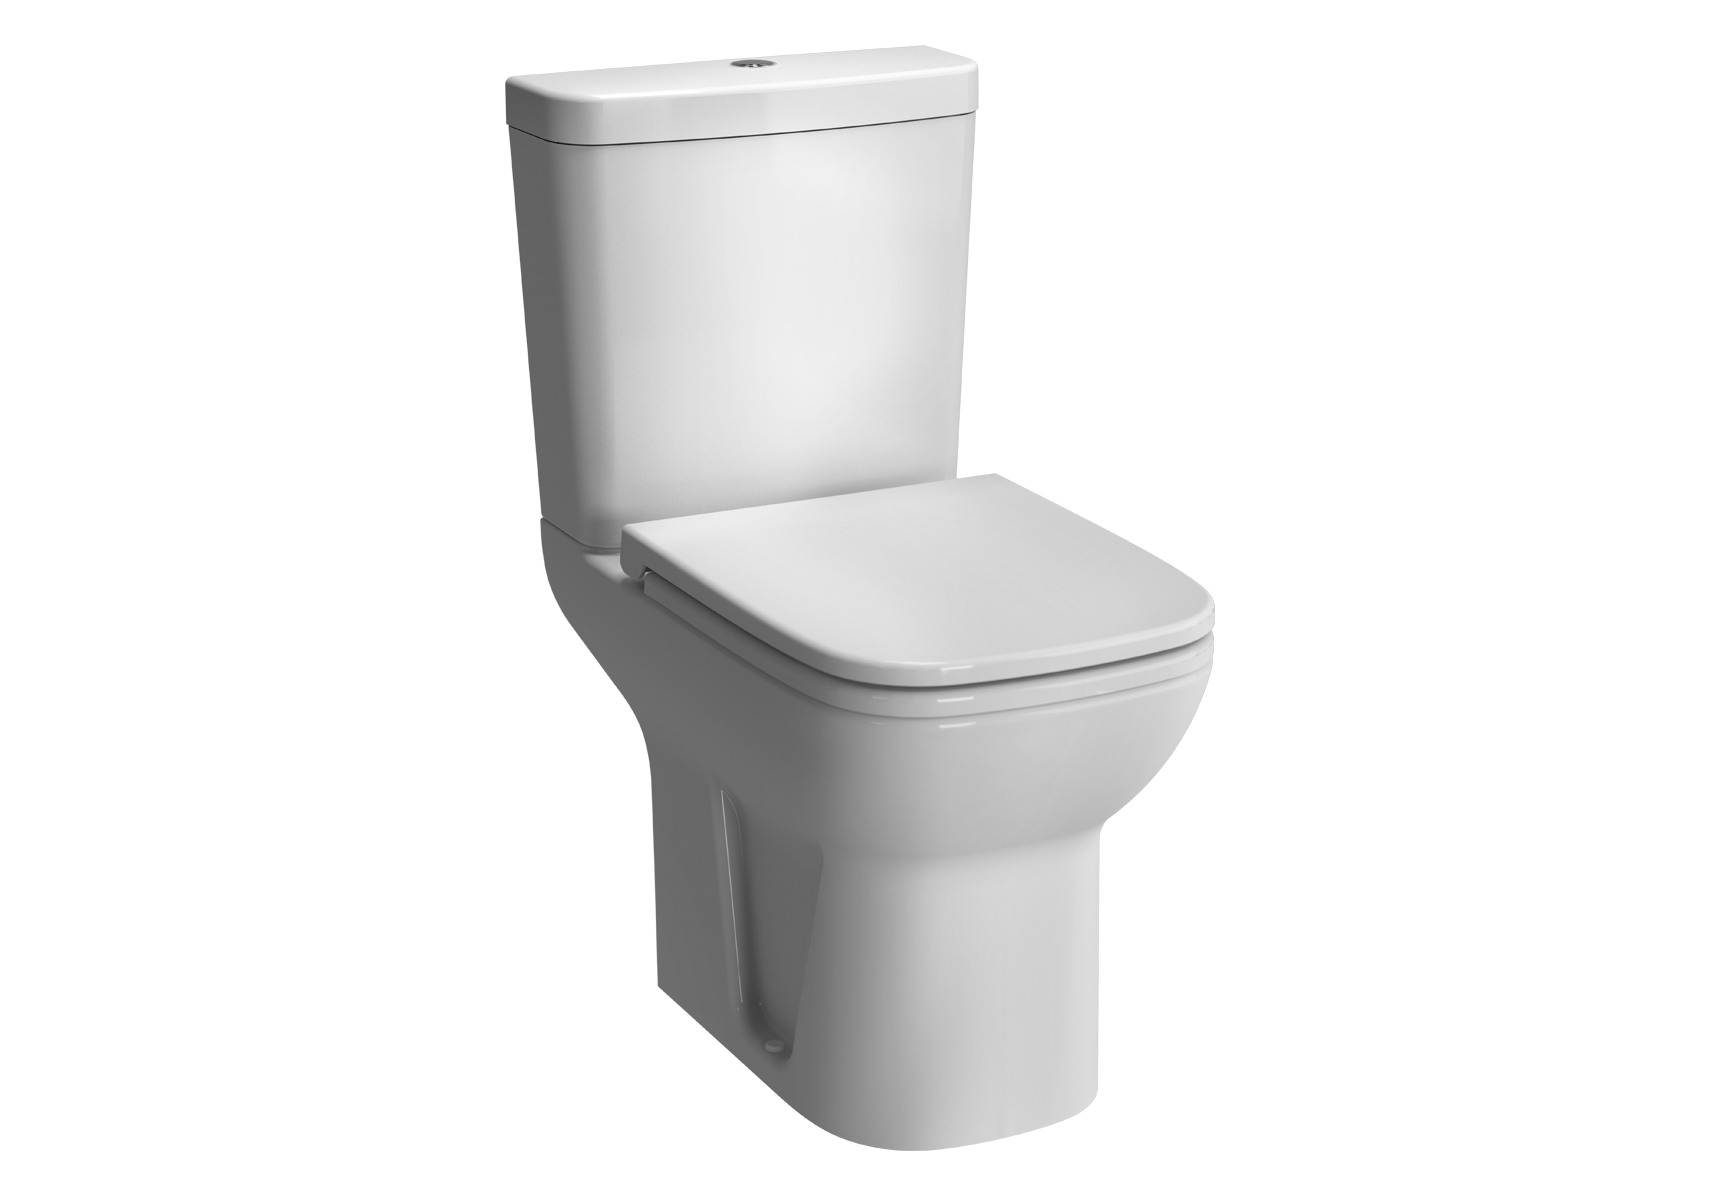 S20 Pack WC à poser, 61,5 cm, sortie universel, abattant Duroplast, fermeture douce